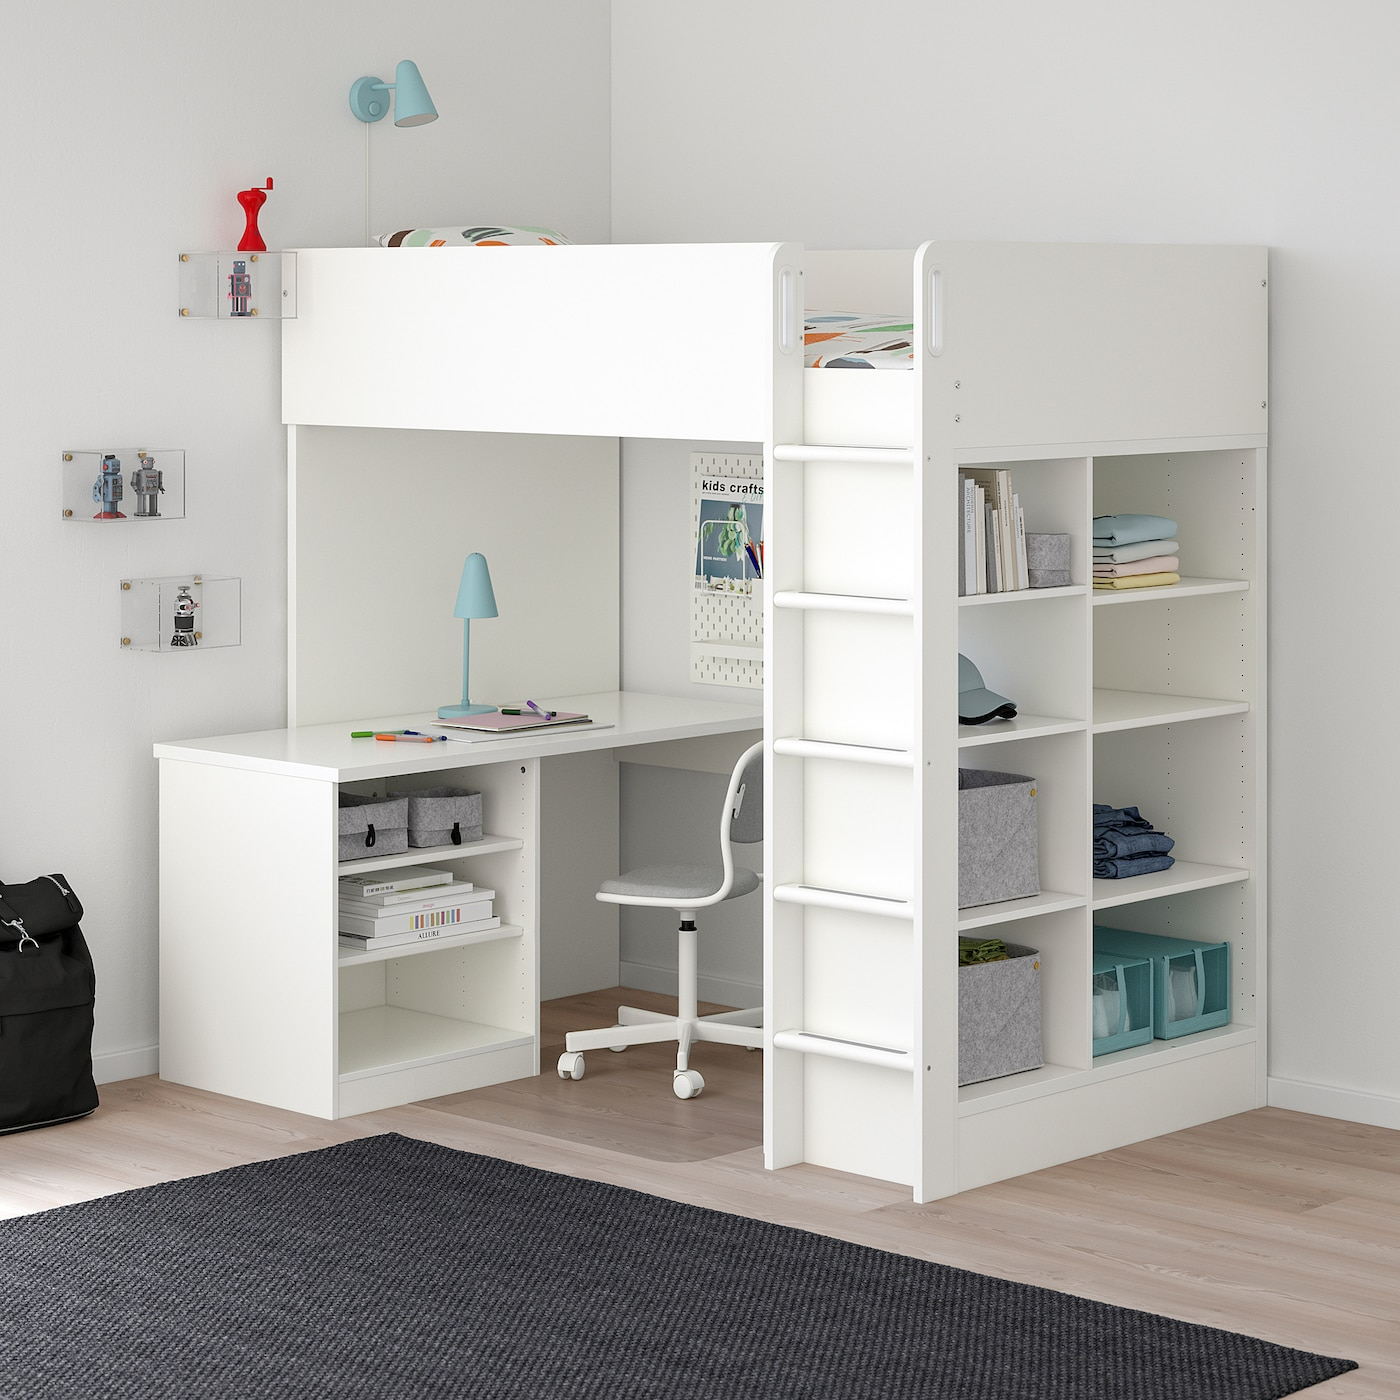 Picture of: Stuva Loft Bed Combo W 2 Shlvs 3 Shlvs White Single Ikea